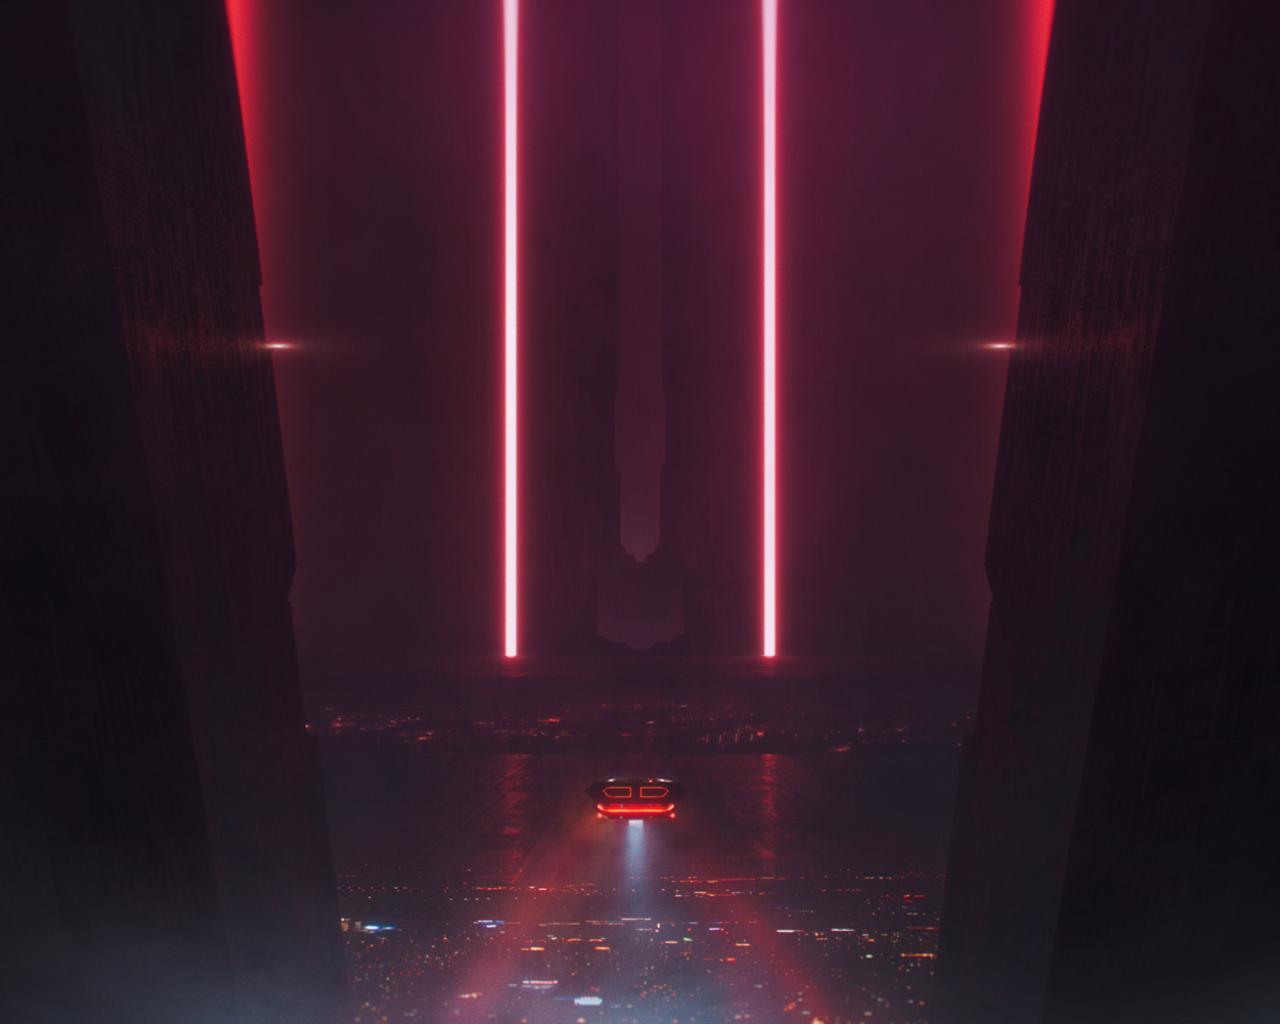 1280x1024 Blade Runner 2049 Cityscape Digital Art 1280x1024